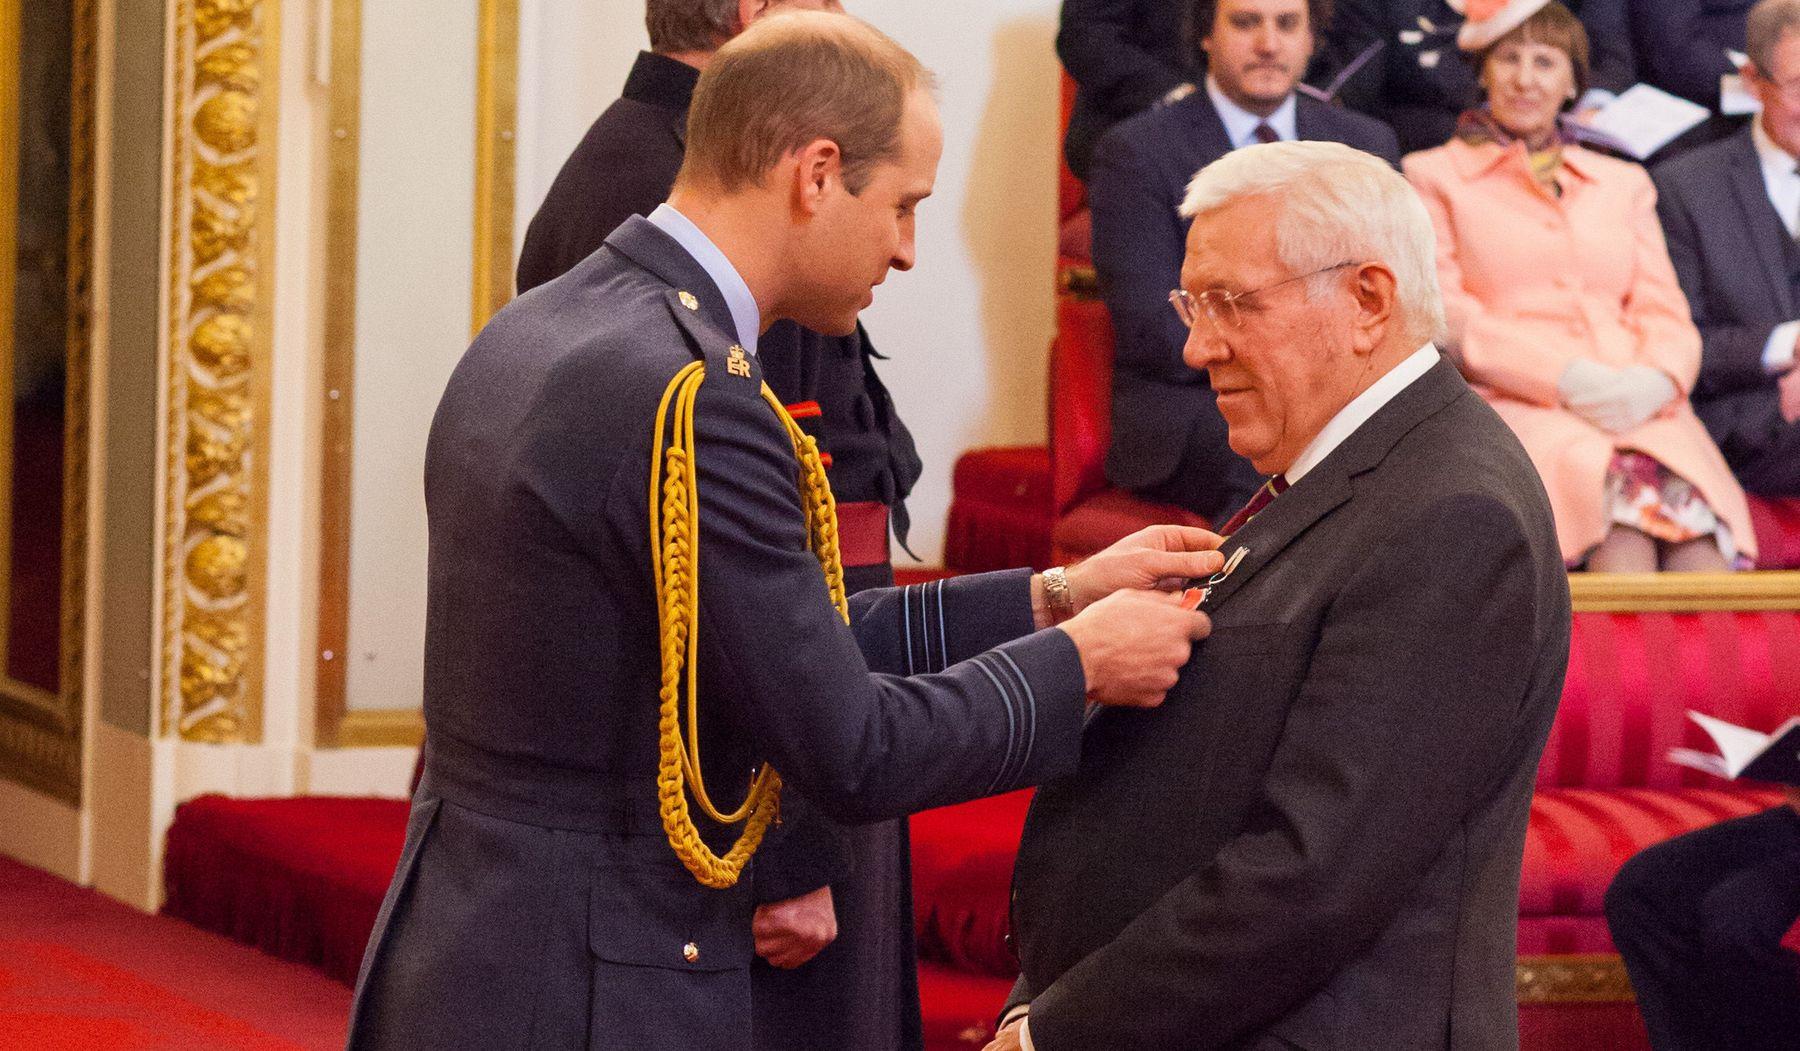 Welsh Rugby President Honoured